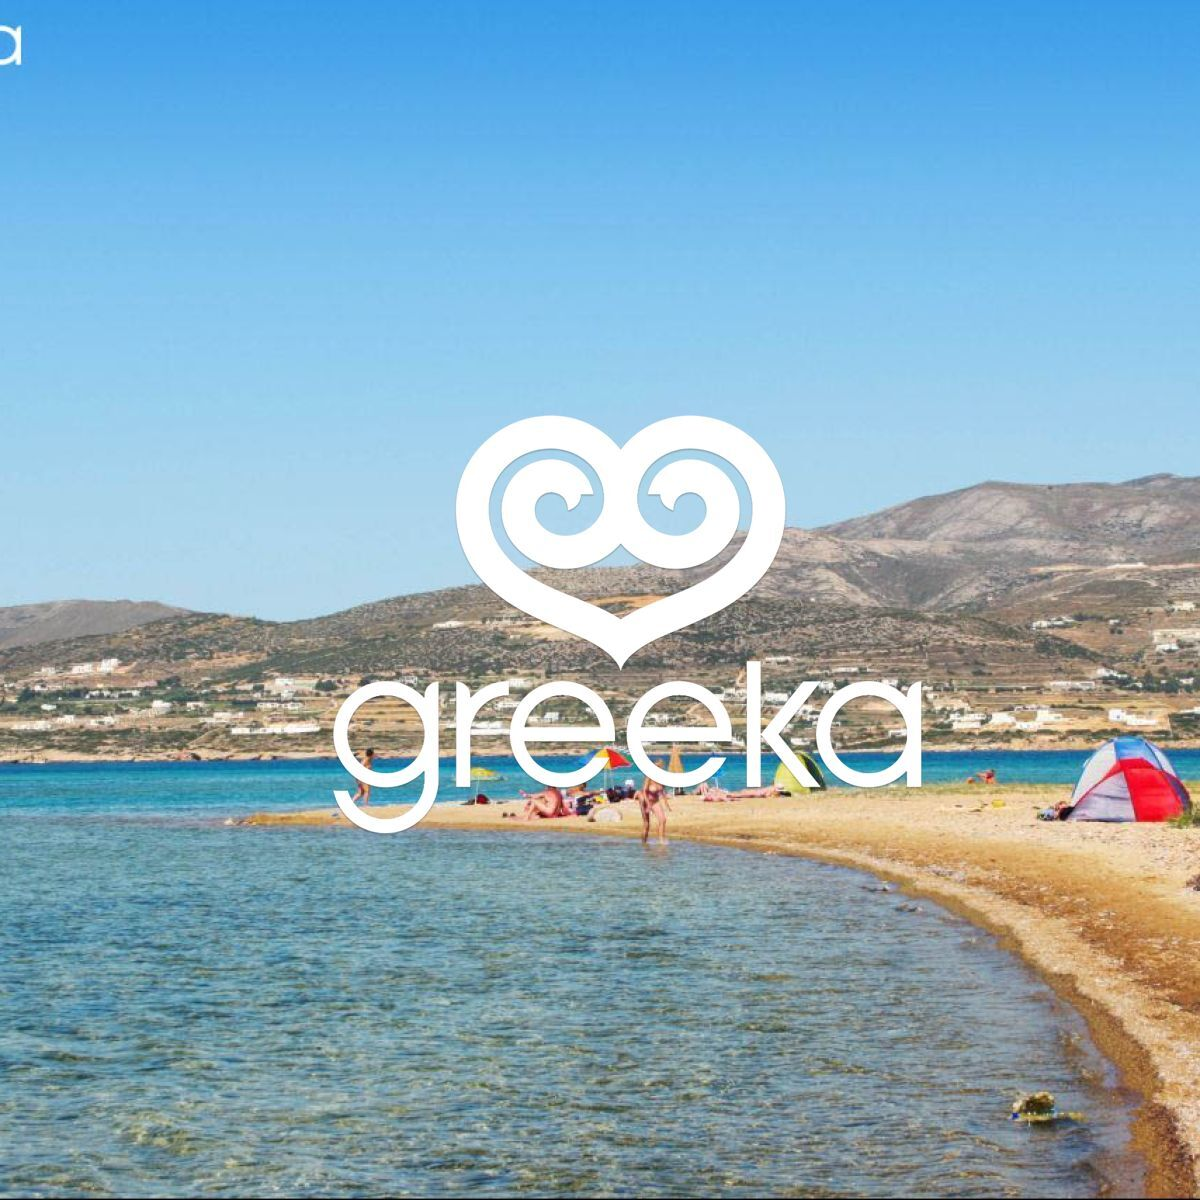 Paros Beaches: Antiparos Camping Beach - Antiparos Beaches